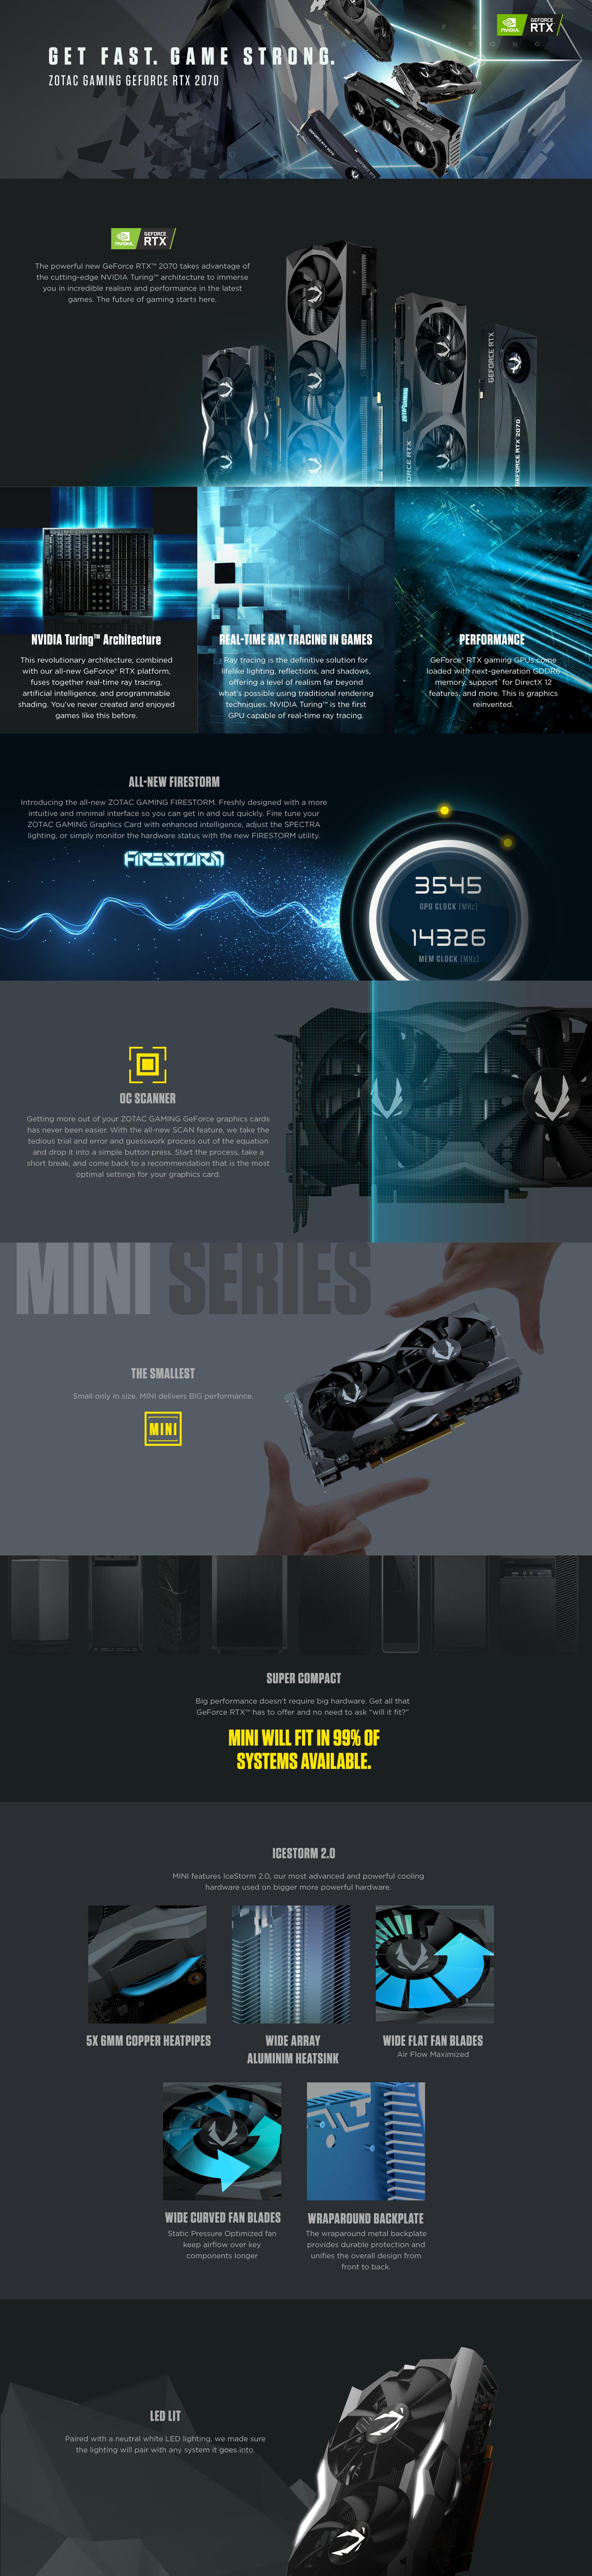 ZOTAC GAMING GeForce RTX 2070 MINI | ZOTAC